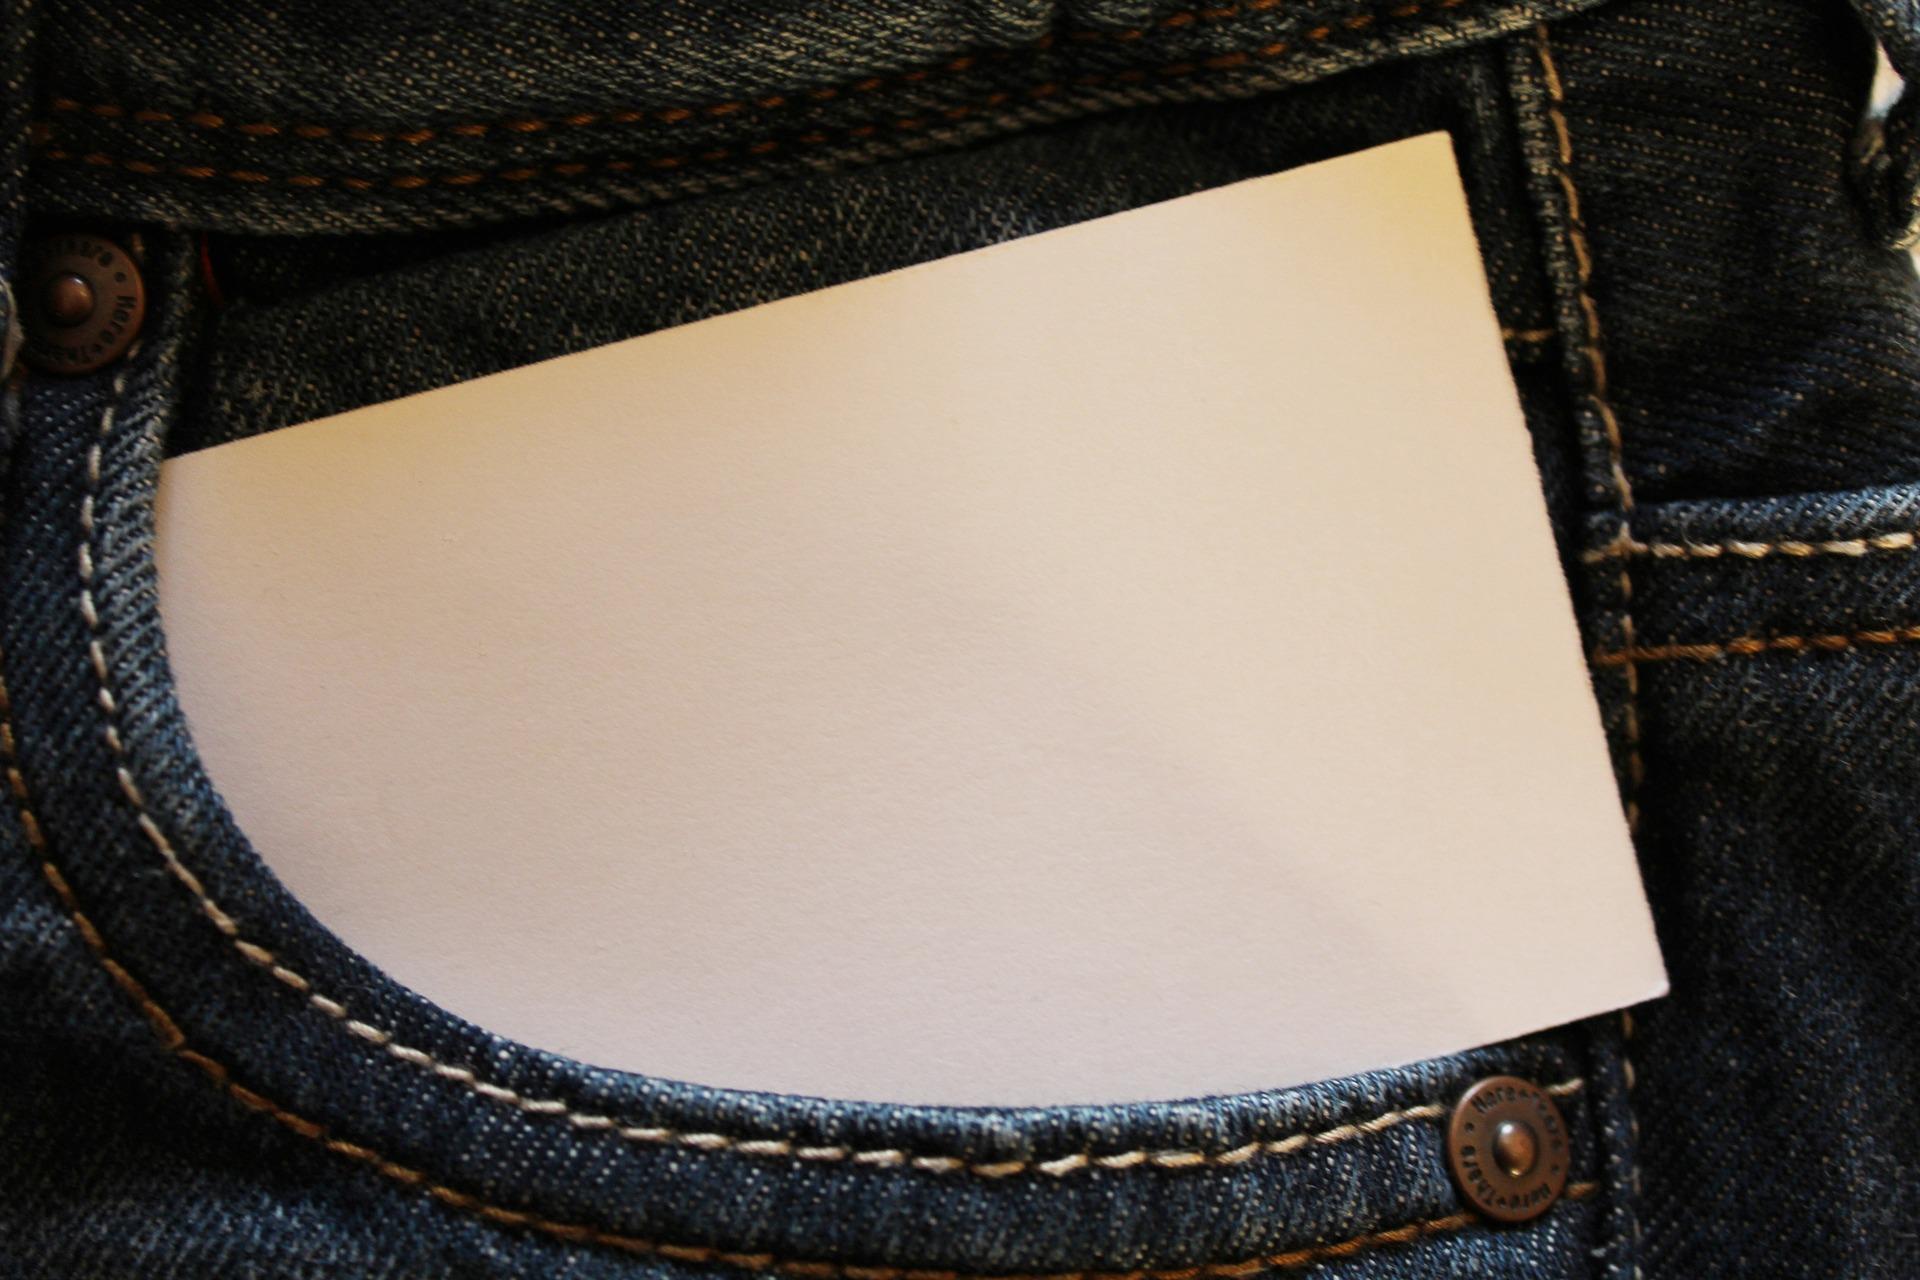 jeans-1302270_1920.jpg